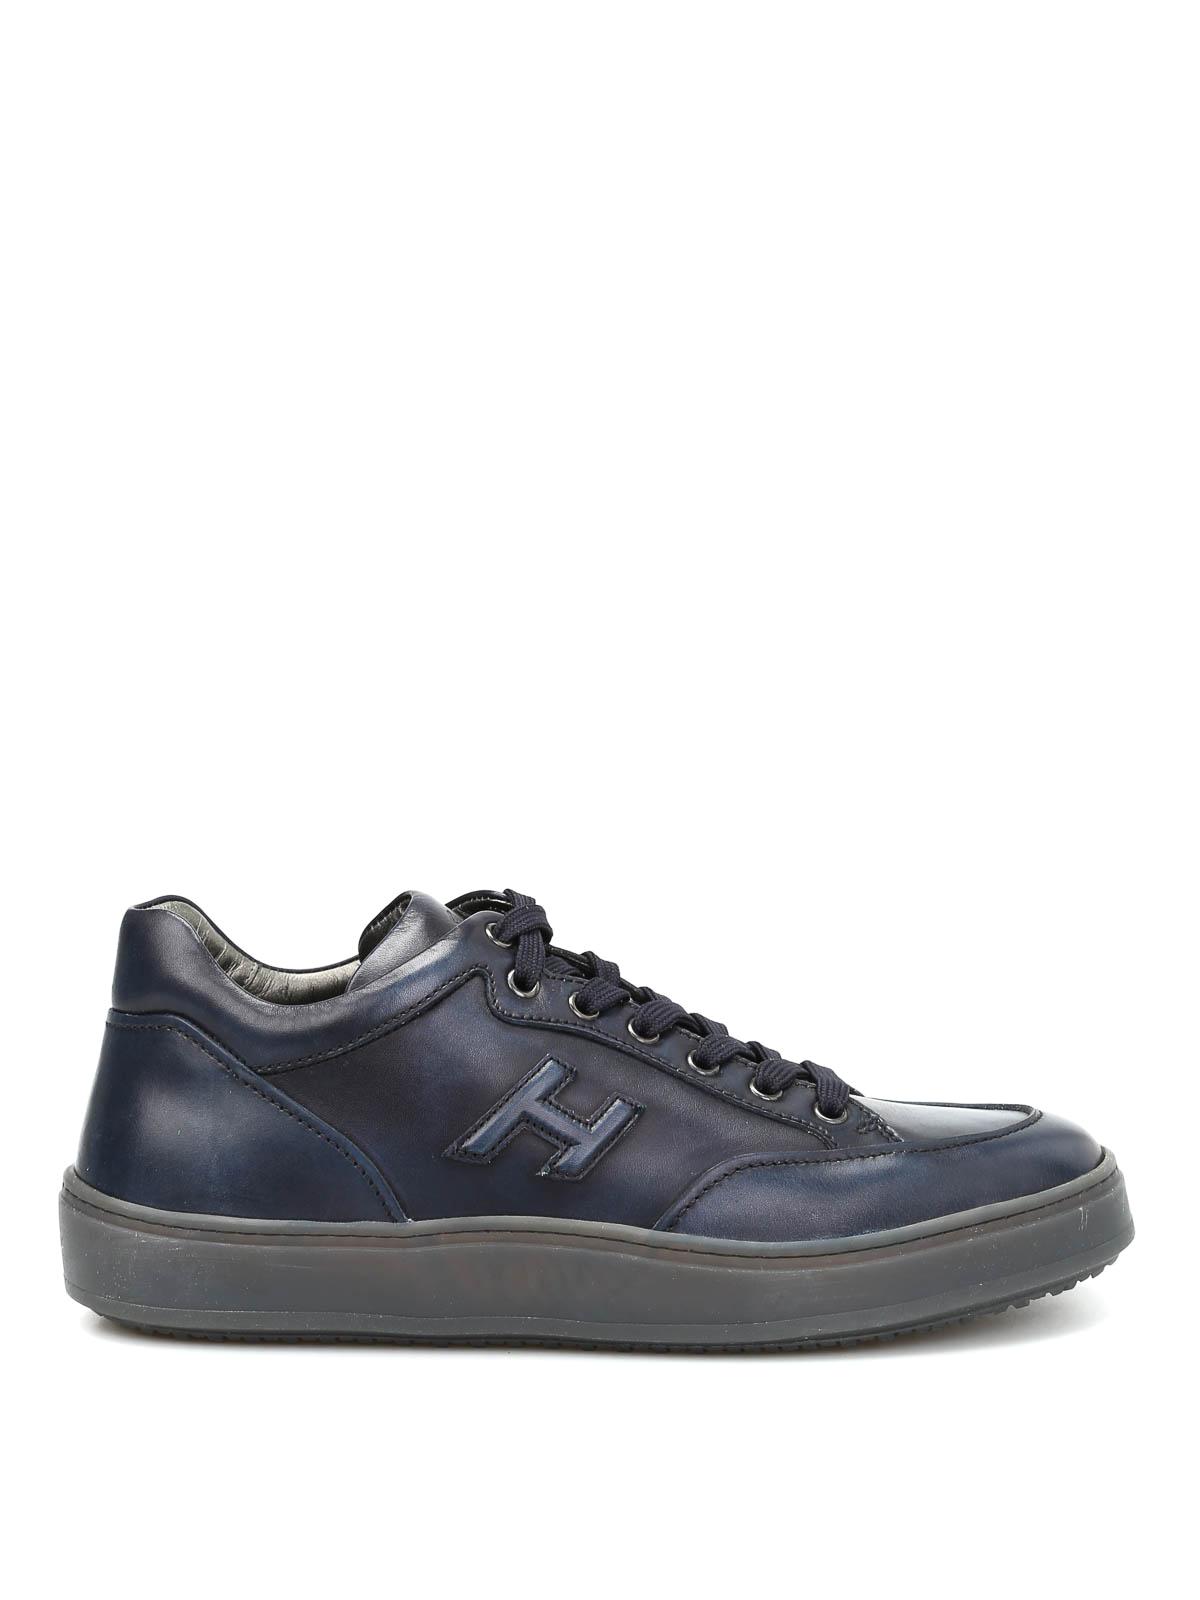 Hogan - H320 Leather Mid Cut sneakers - trainers - HXM3020W5607X7U806